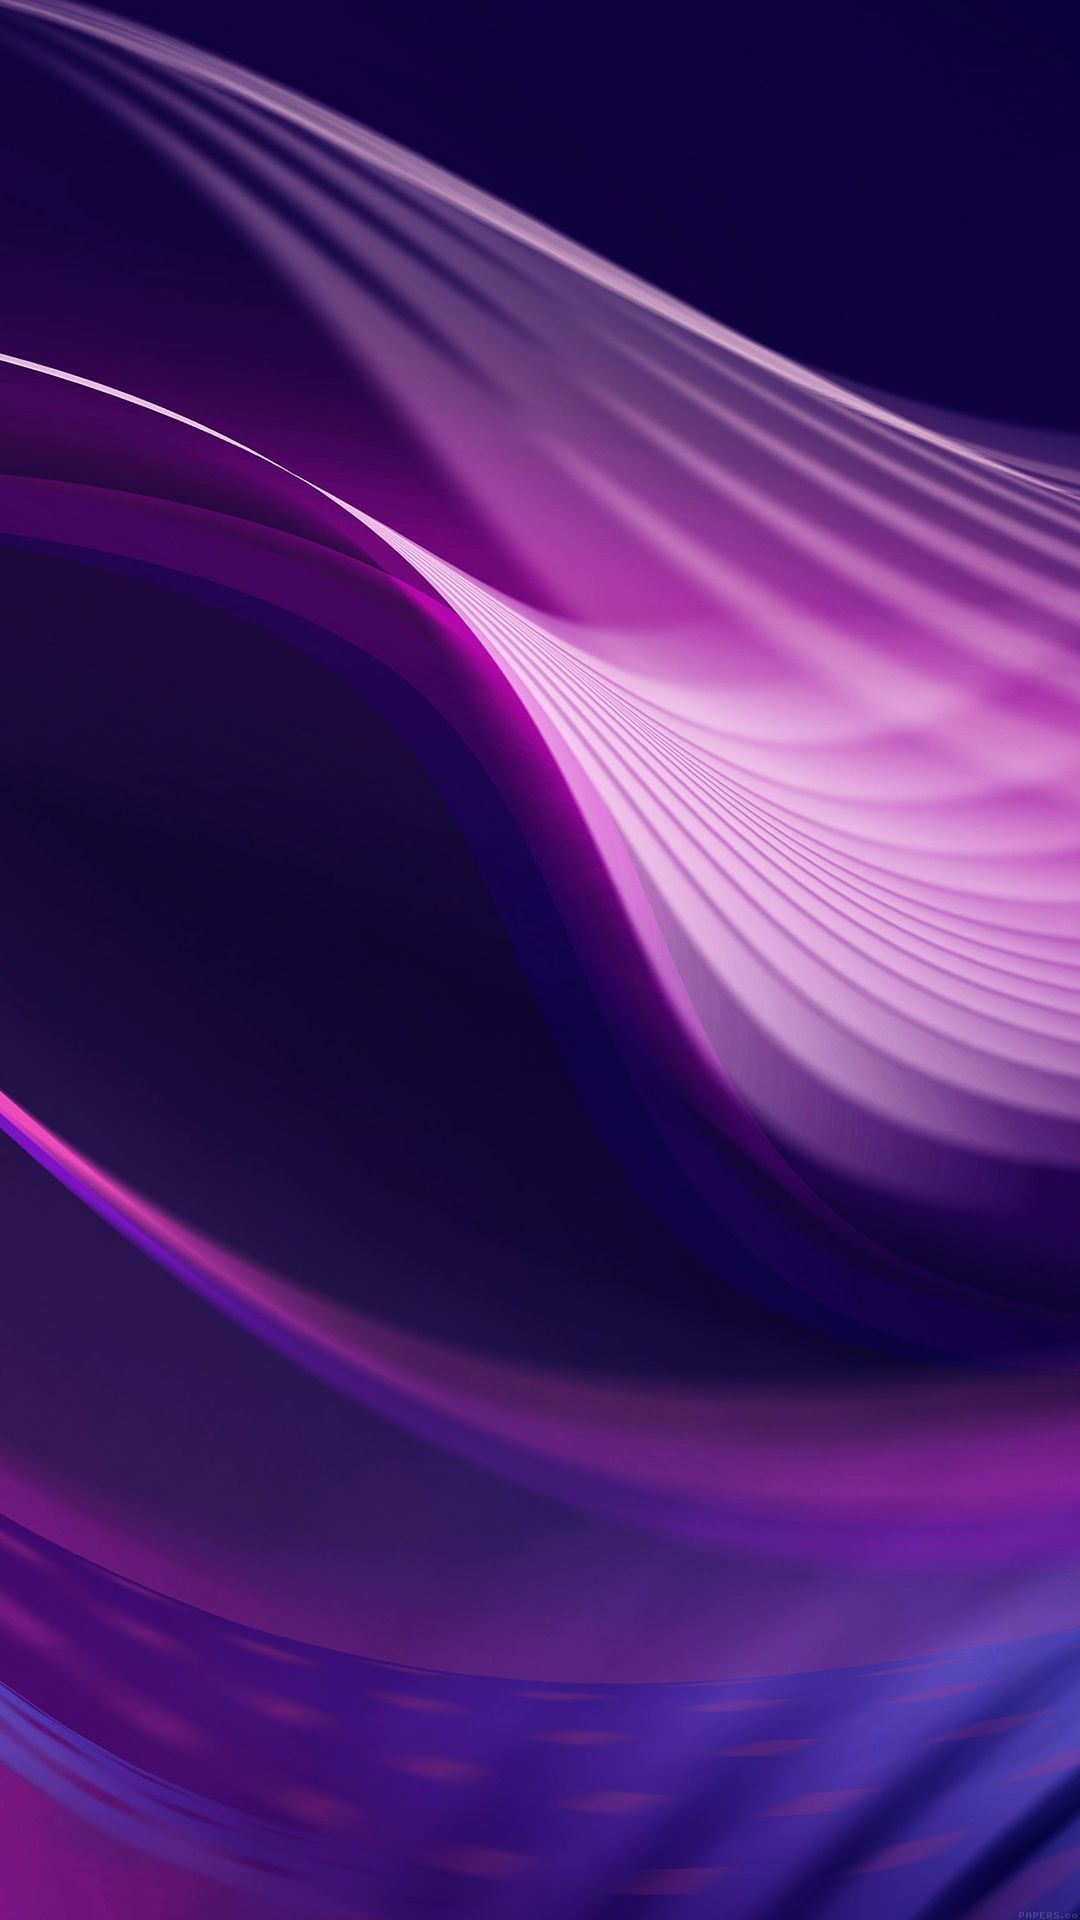 Wave abstract purple pattern iphone 6 plus wallpaper iphone 6 wave abstract purple pattern iphone 6 plus wallpaper voltagebd Gallery